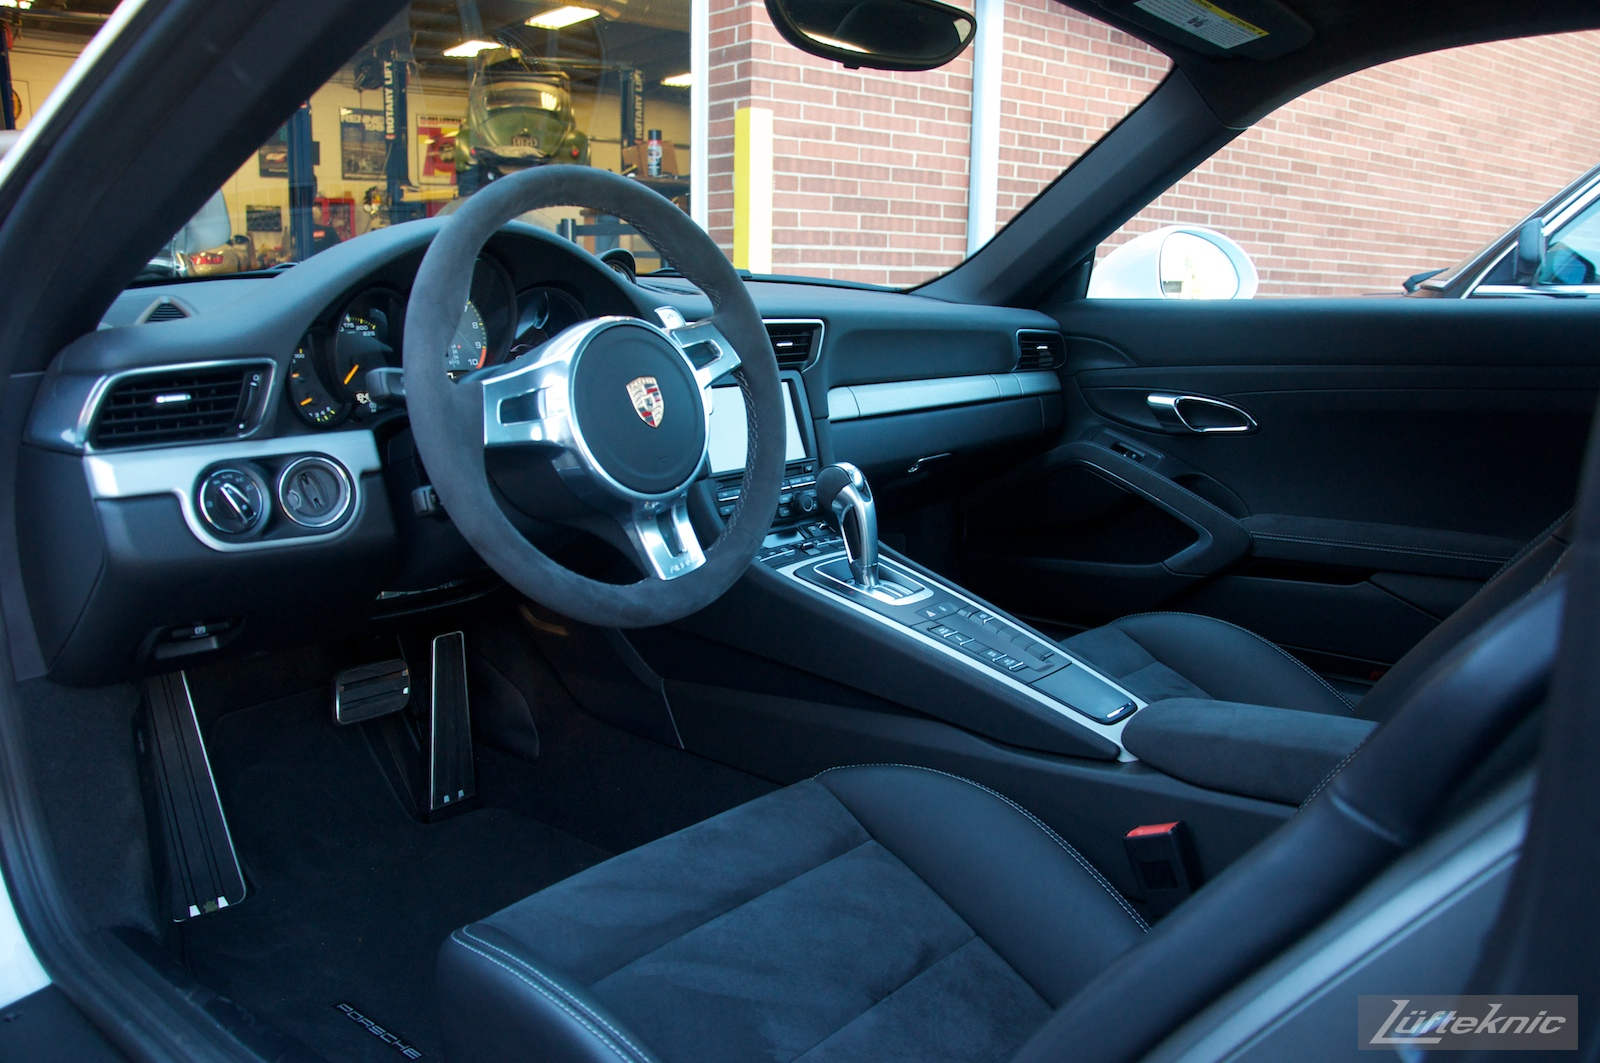 Lux interior of the Lüfteknic Porsche 991 GT3. Suede everywhere!